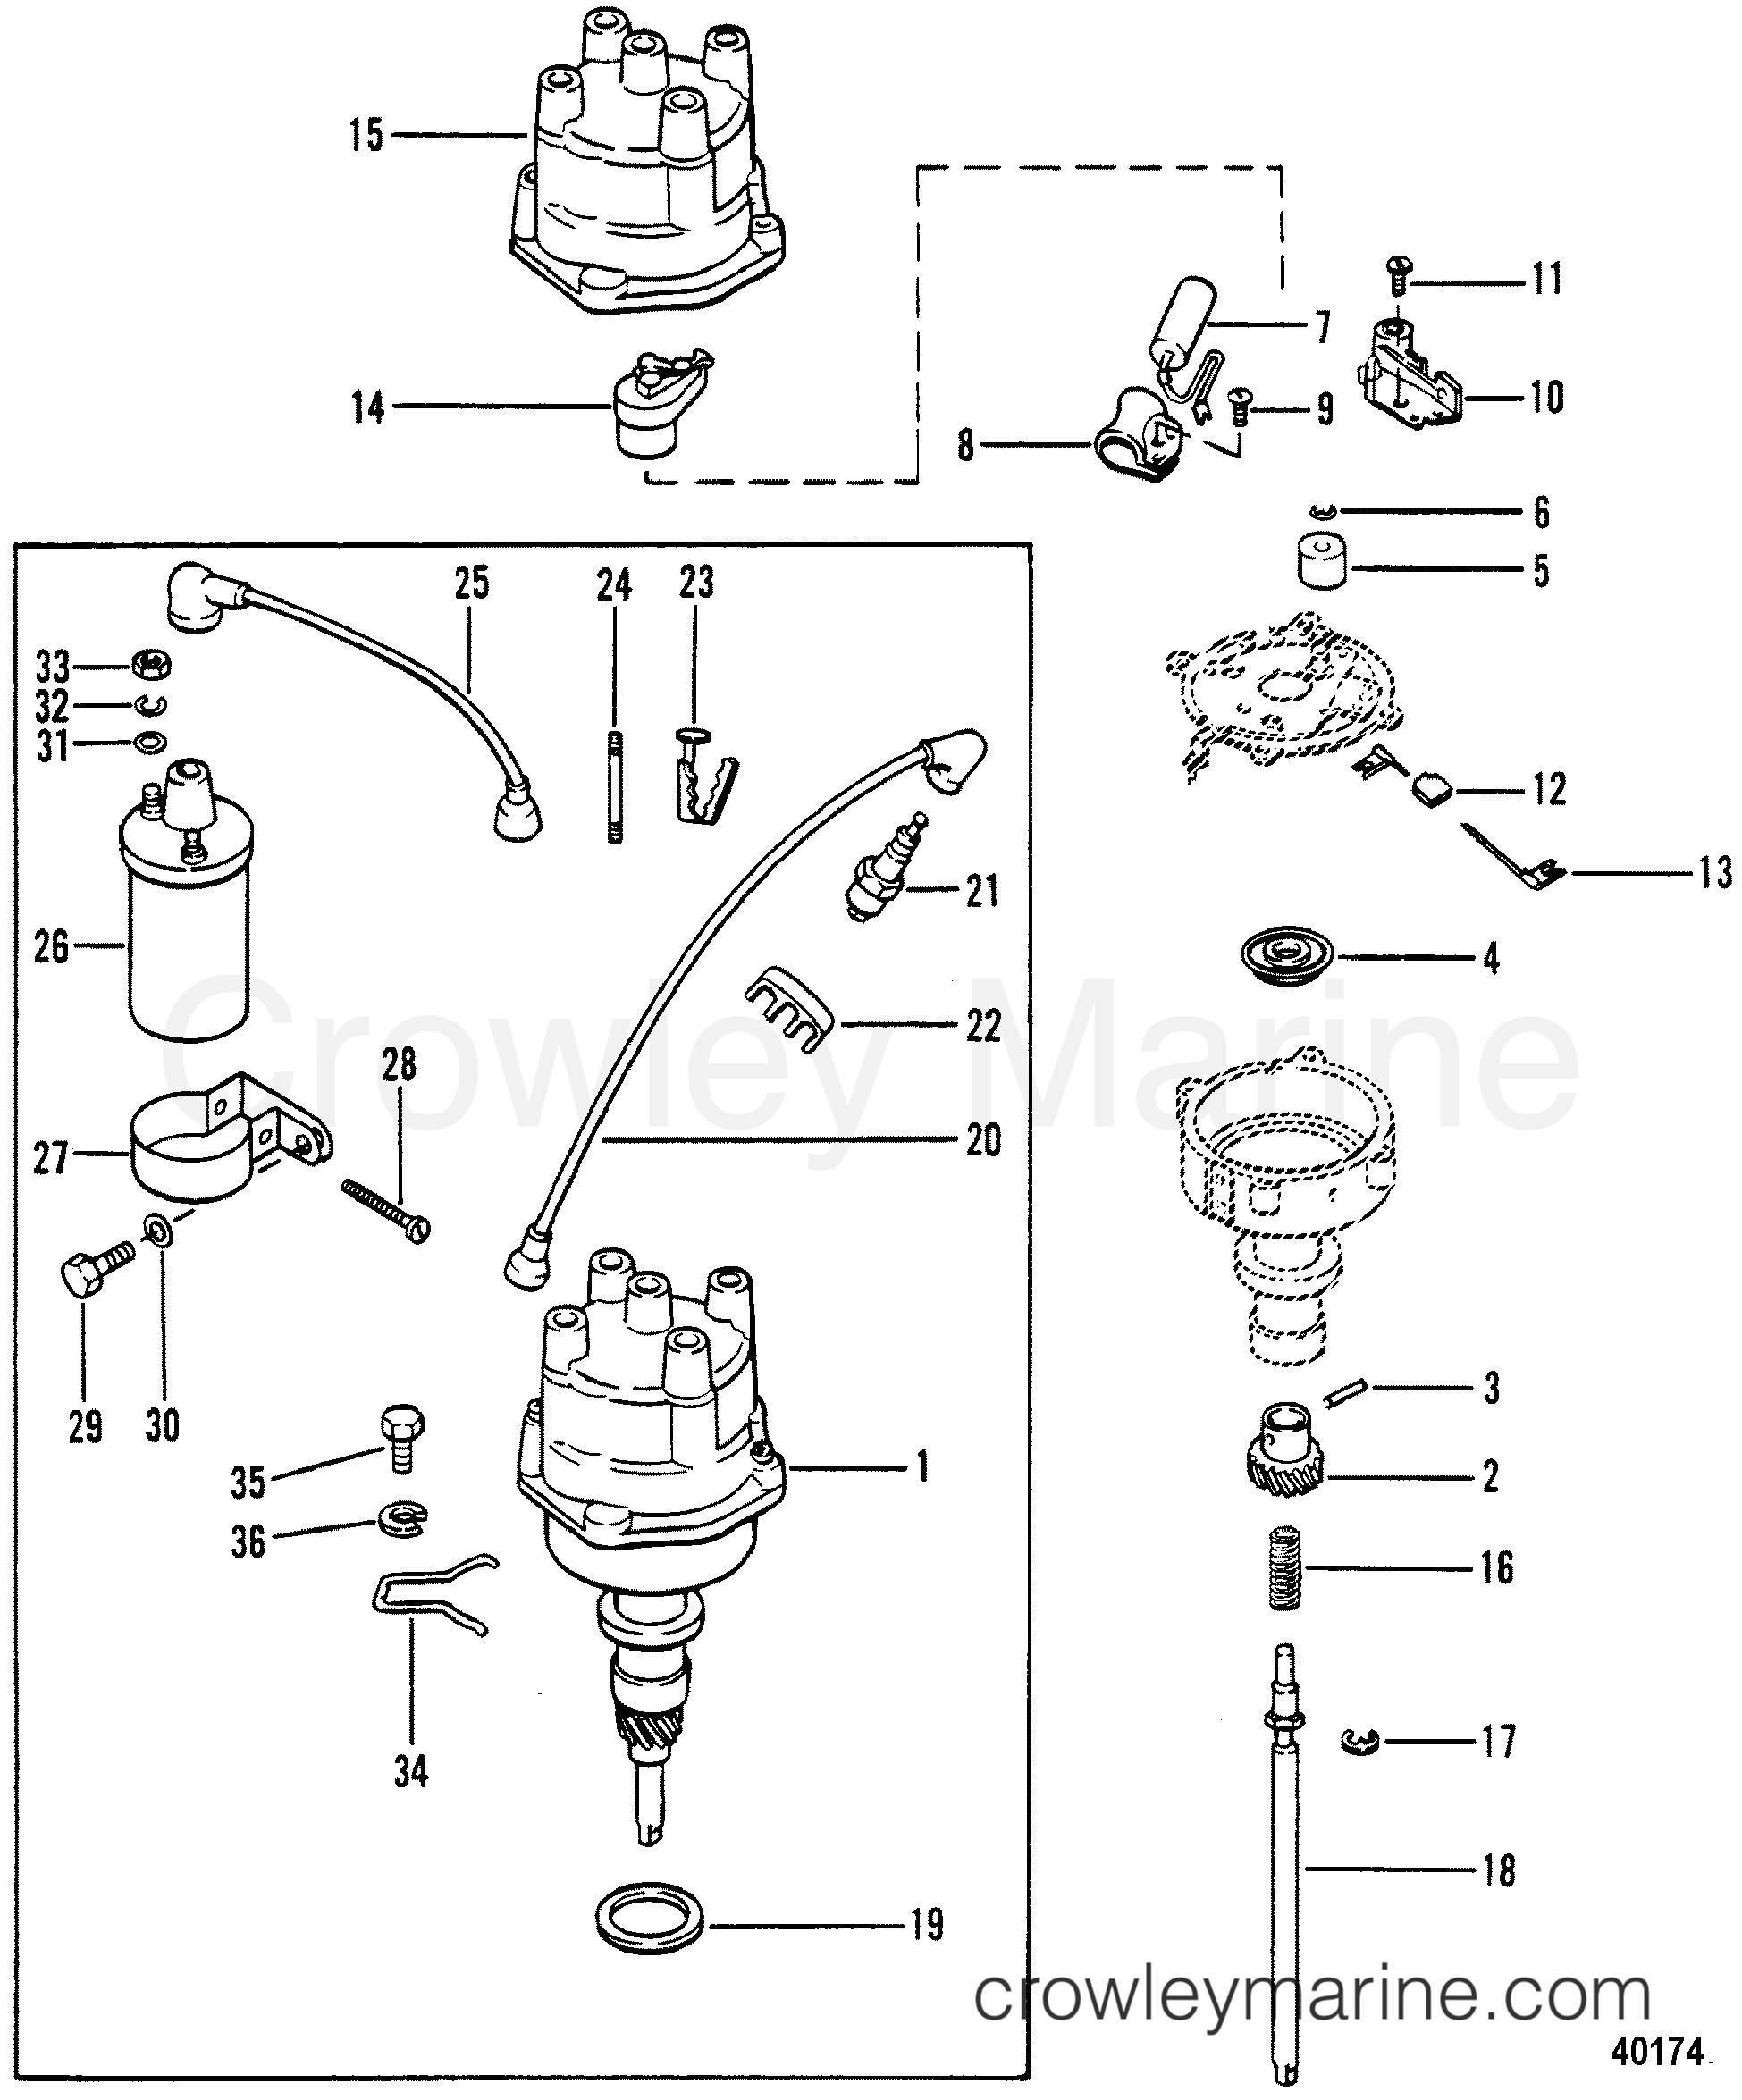 DISTRIBUTOR AND COIL - 1983 Mercruiser 470 04707333 | Crowley MarineCrowley Marine